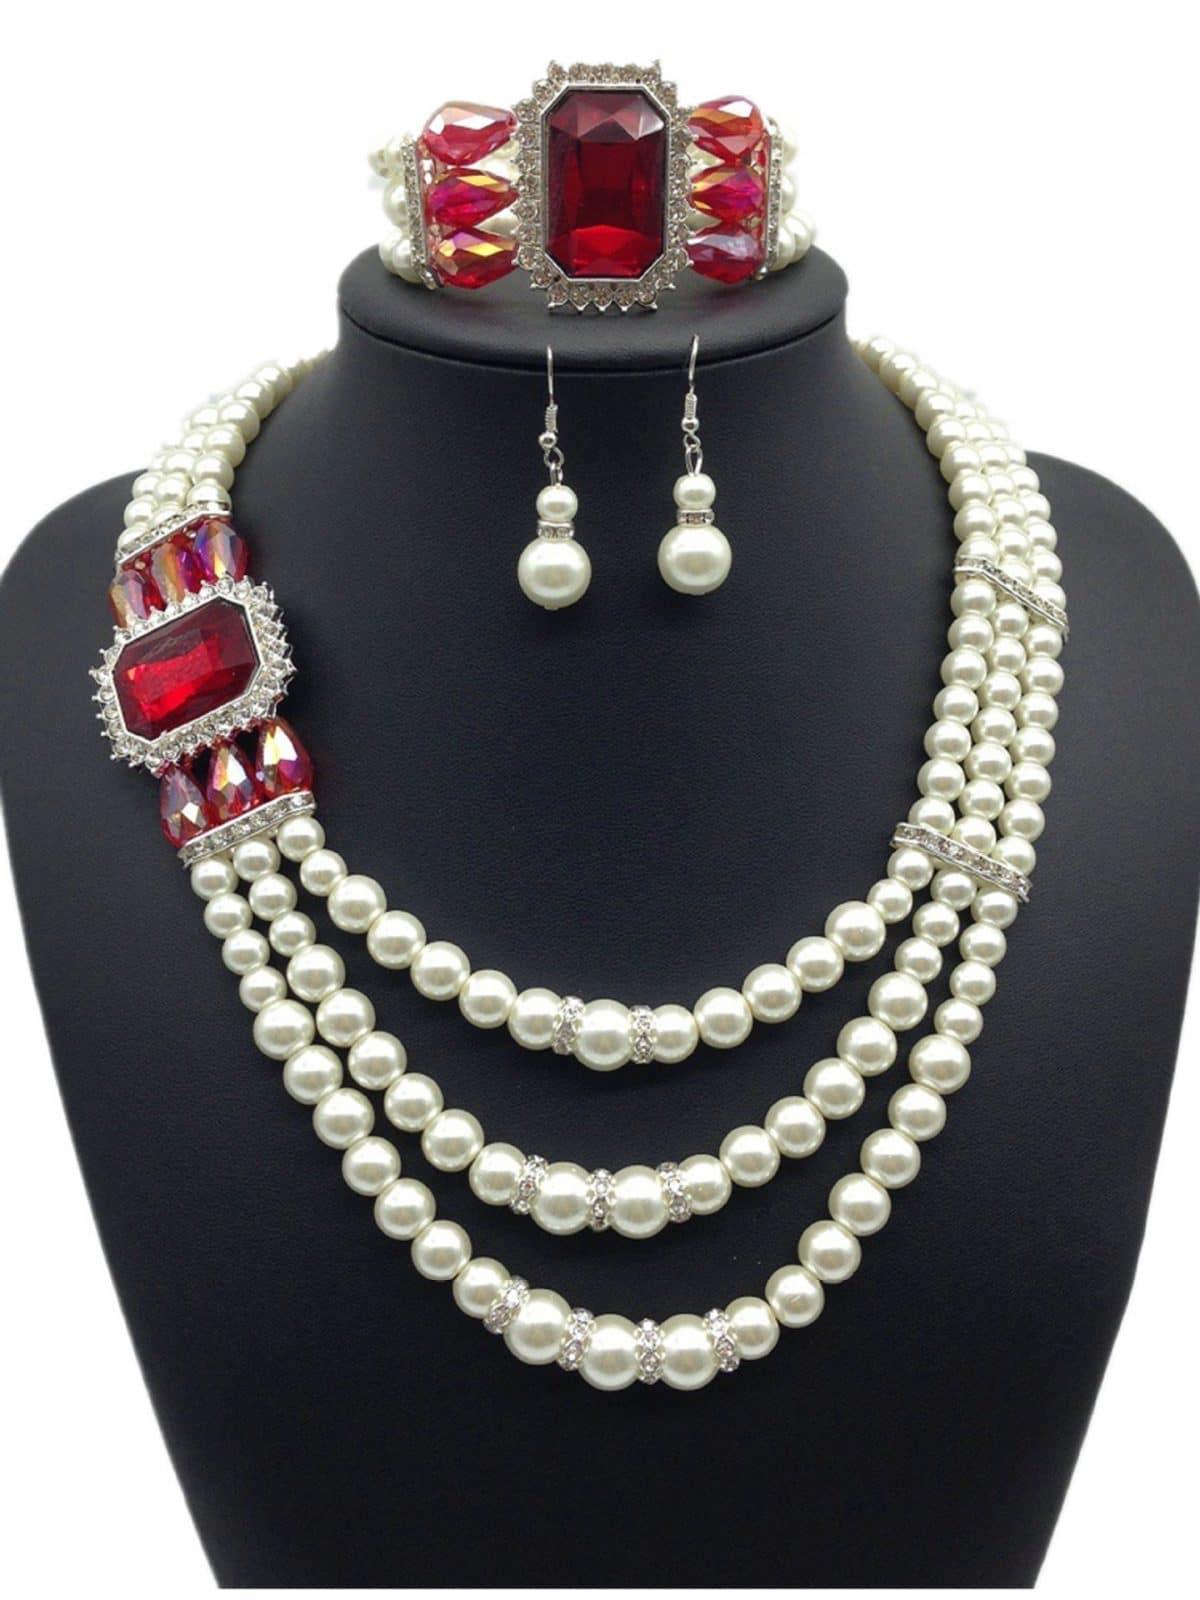 Diamond Gemstone Pearl Necklace Earrings Set